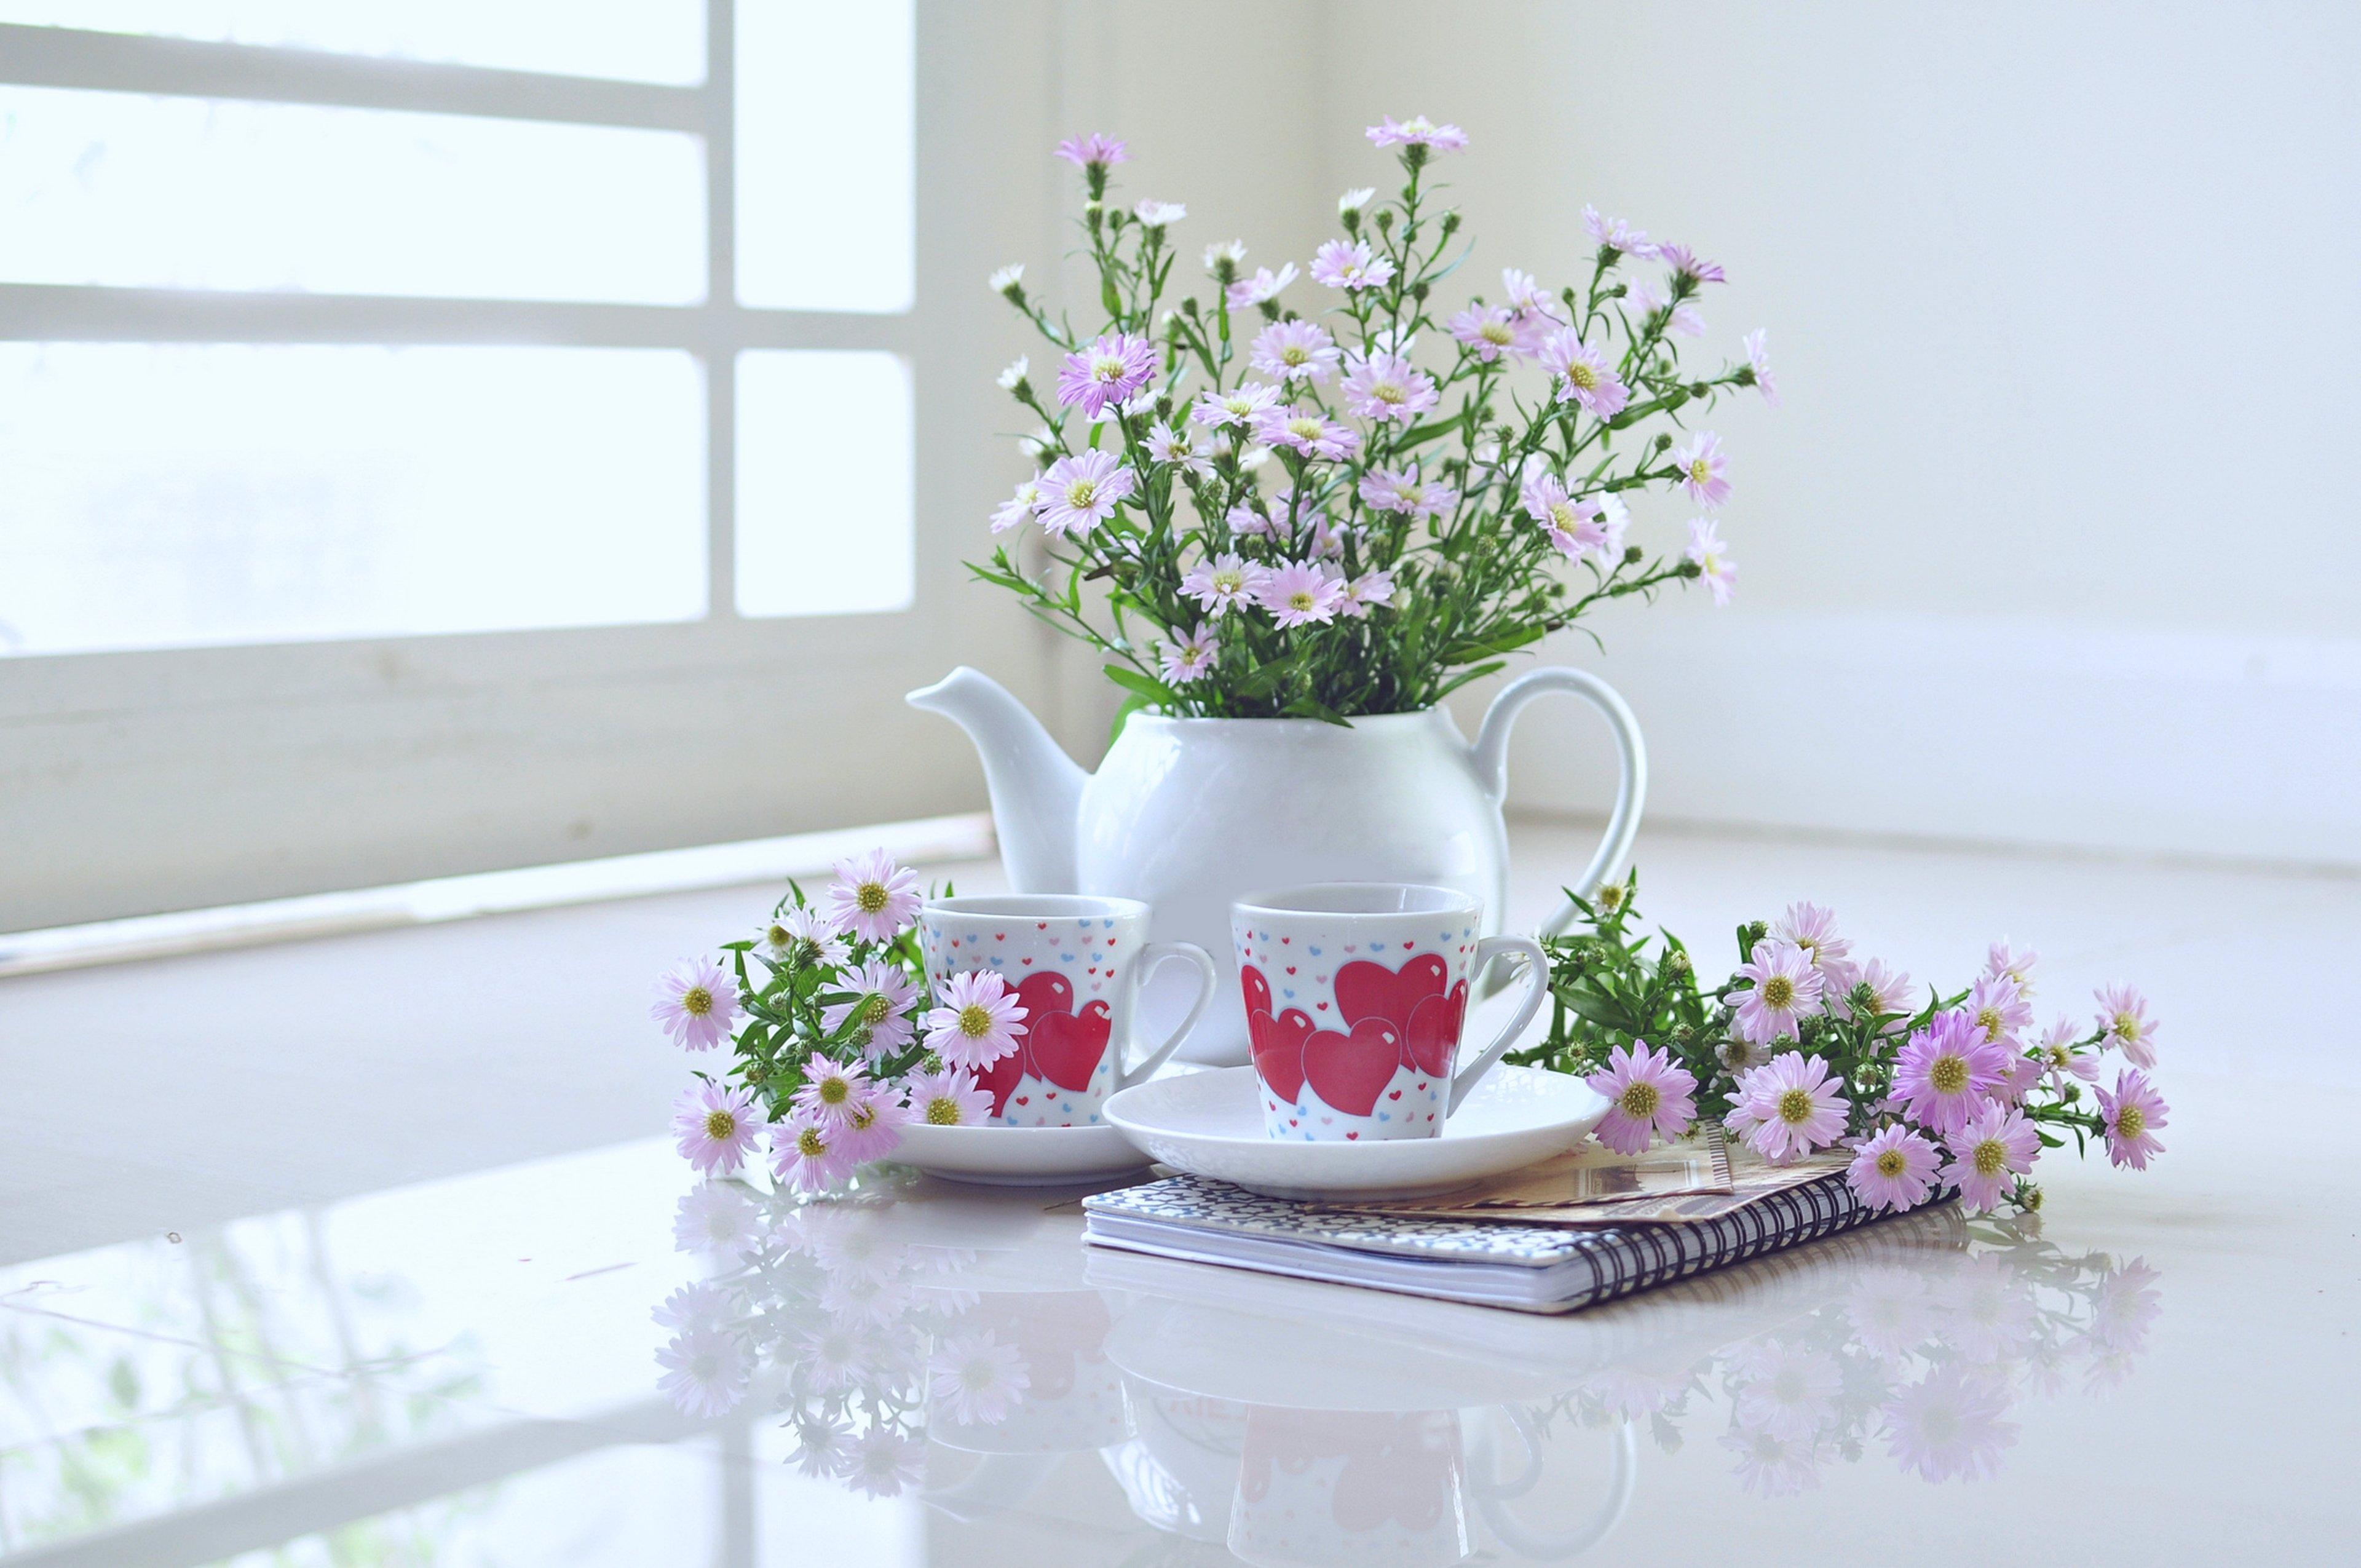 Window Decoration Flowers House Scenery Vase Books Cups